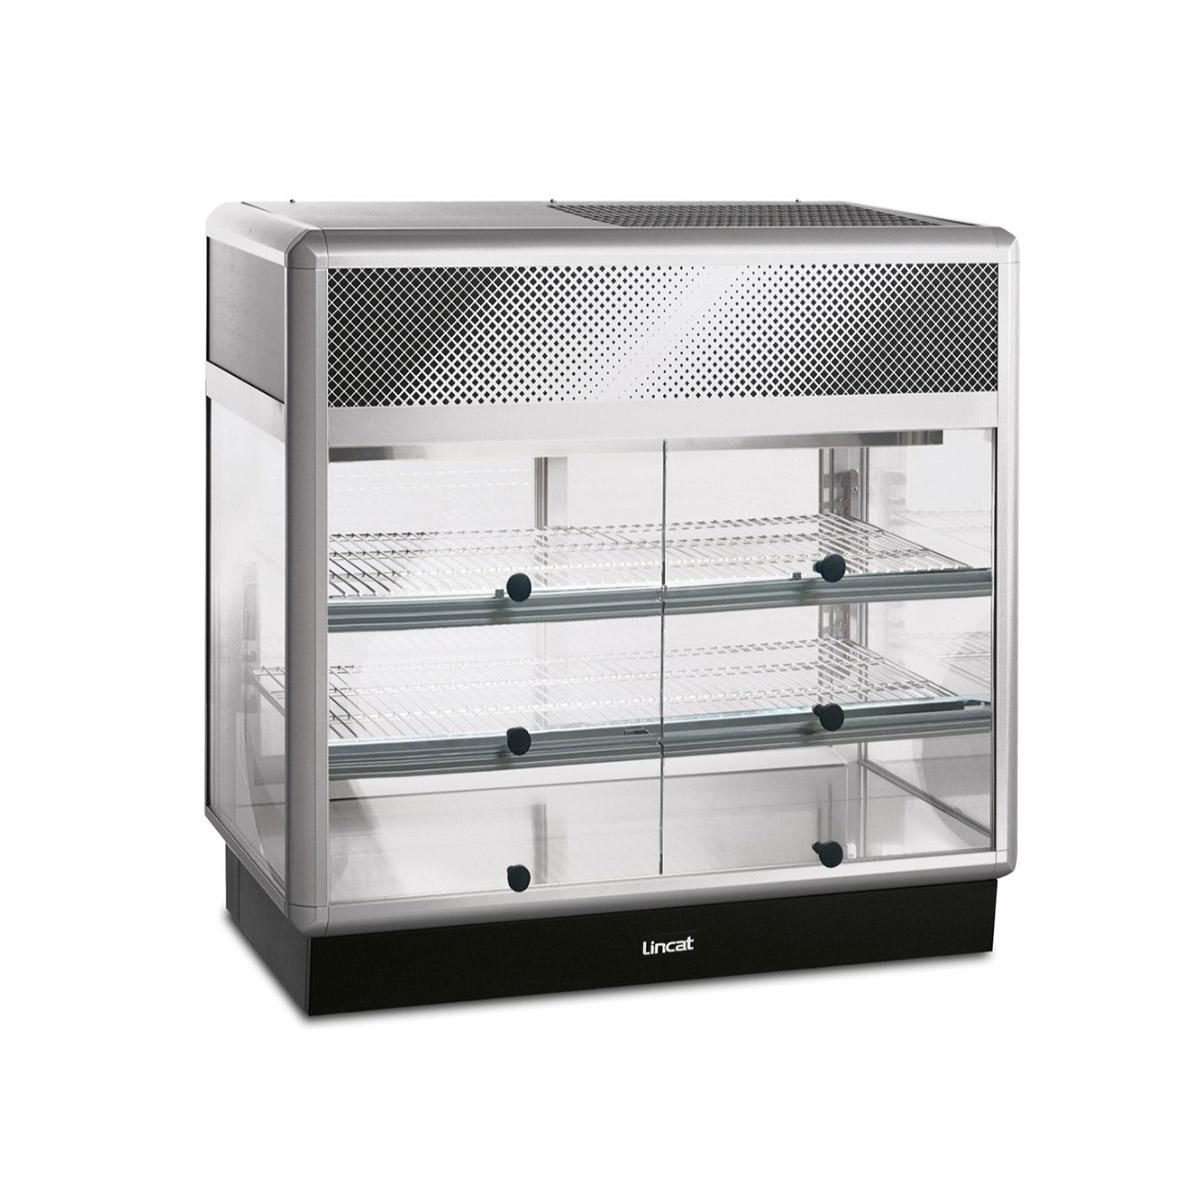 D6R/100S - Lincat Seal 650 Series Counter-top Rectangular Front Refrigerated Merchandiser - Self-Service - W 1000 mm - 0.7 kW